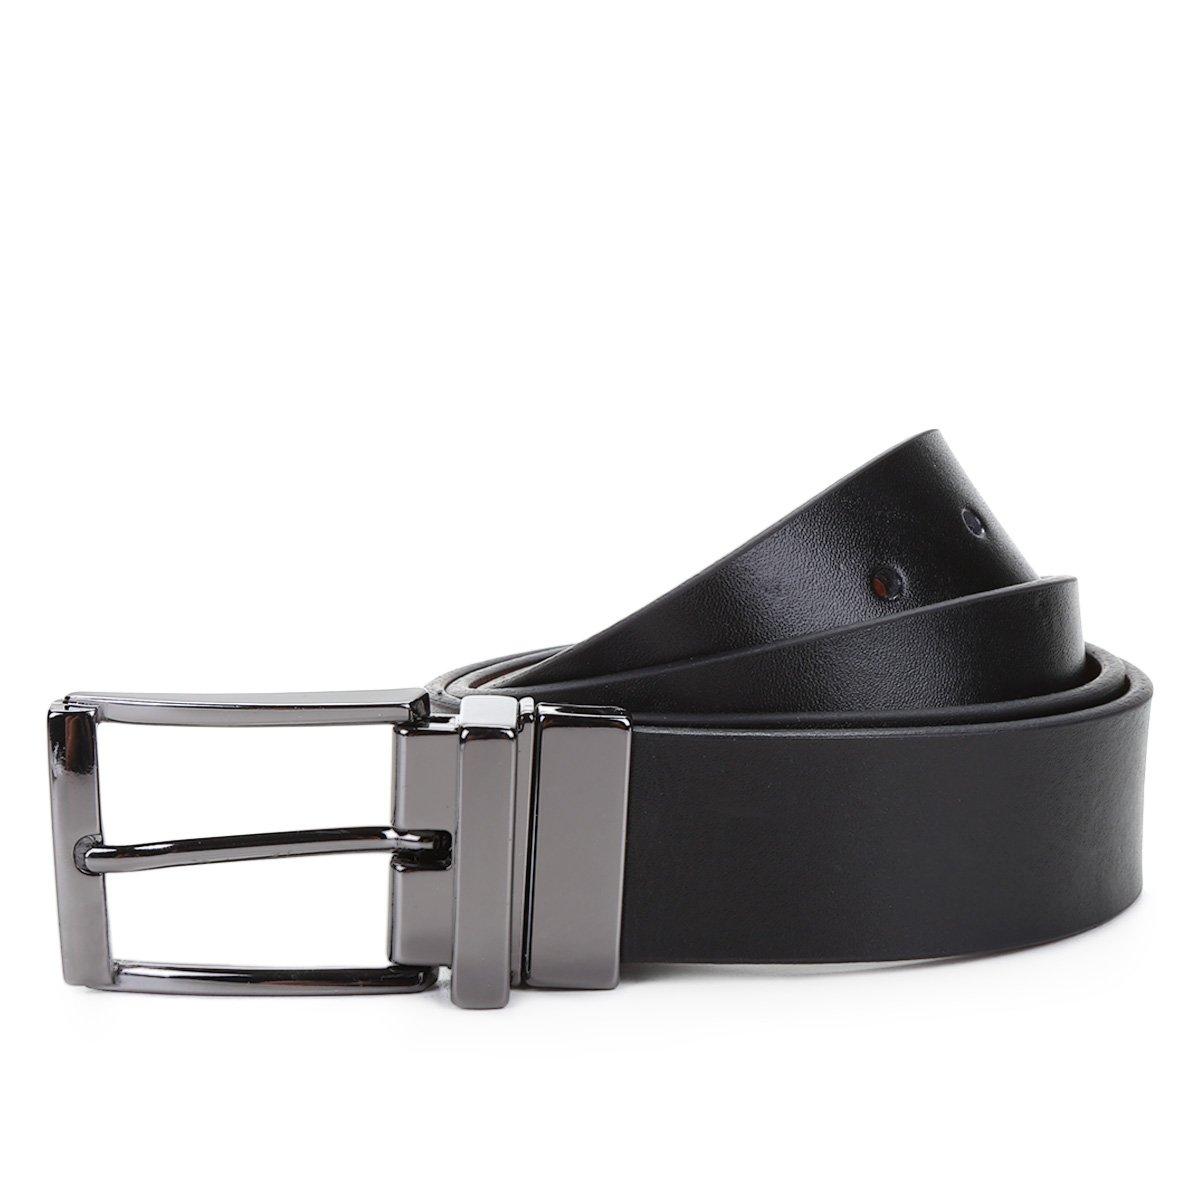 78a392069d Cinto Couro Shoestock Social Reversível A Fio Masculino